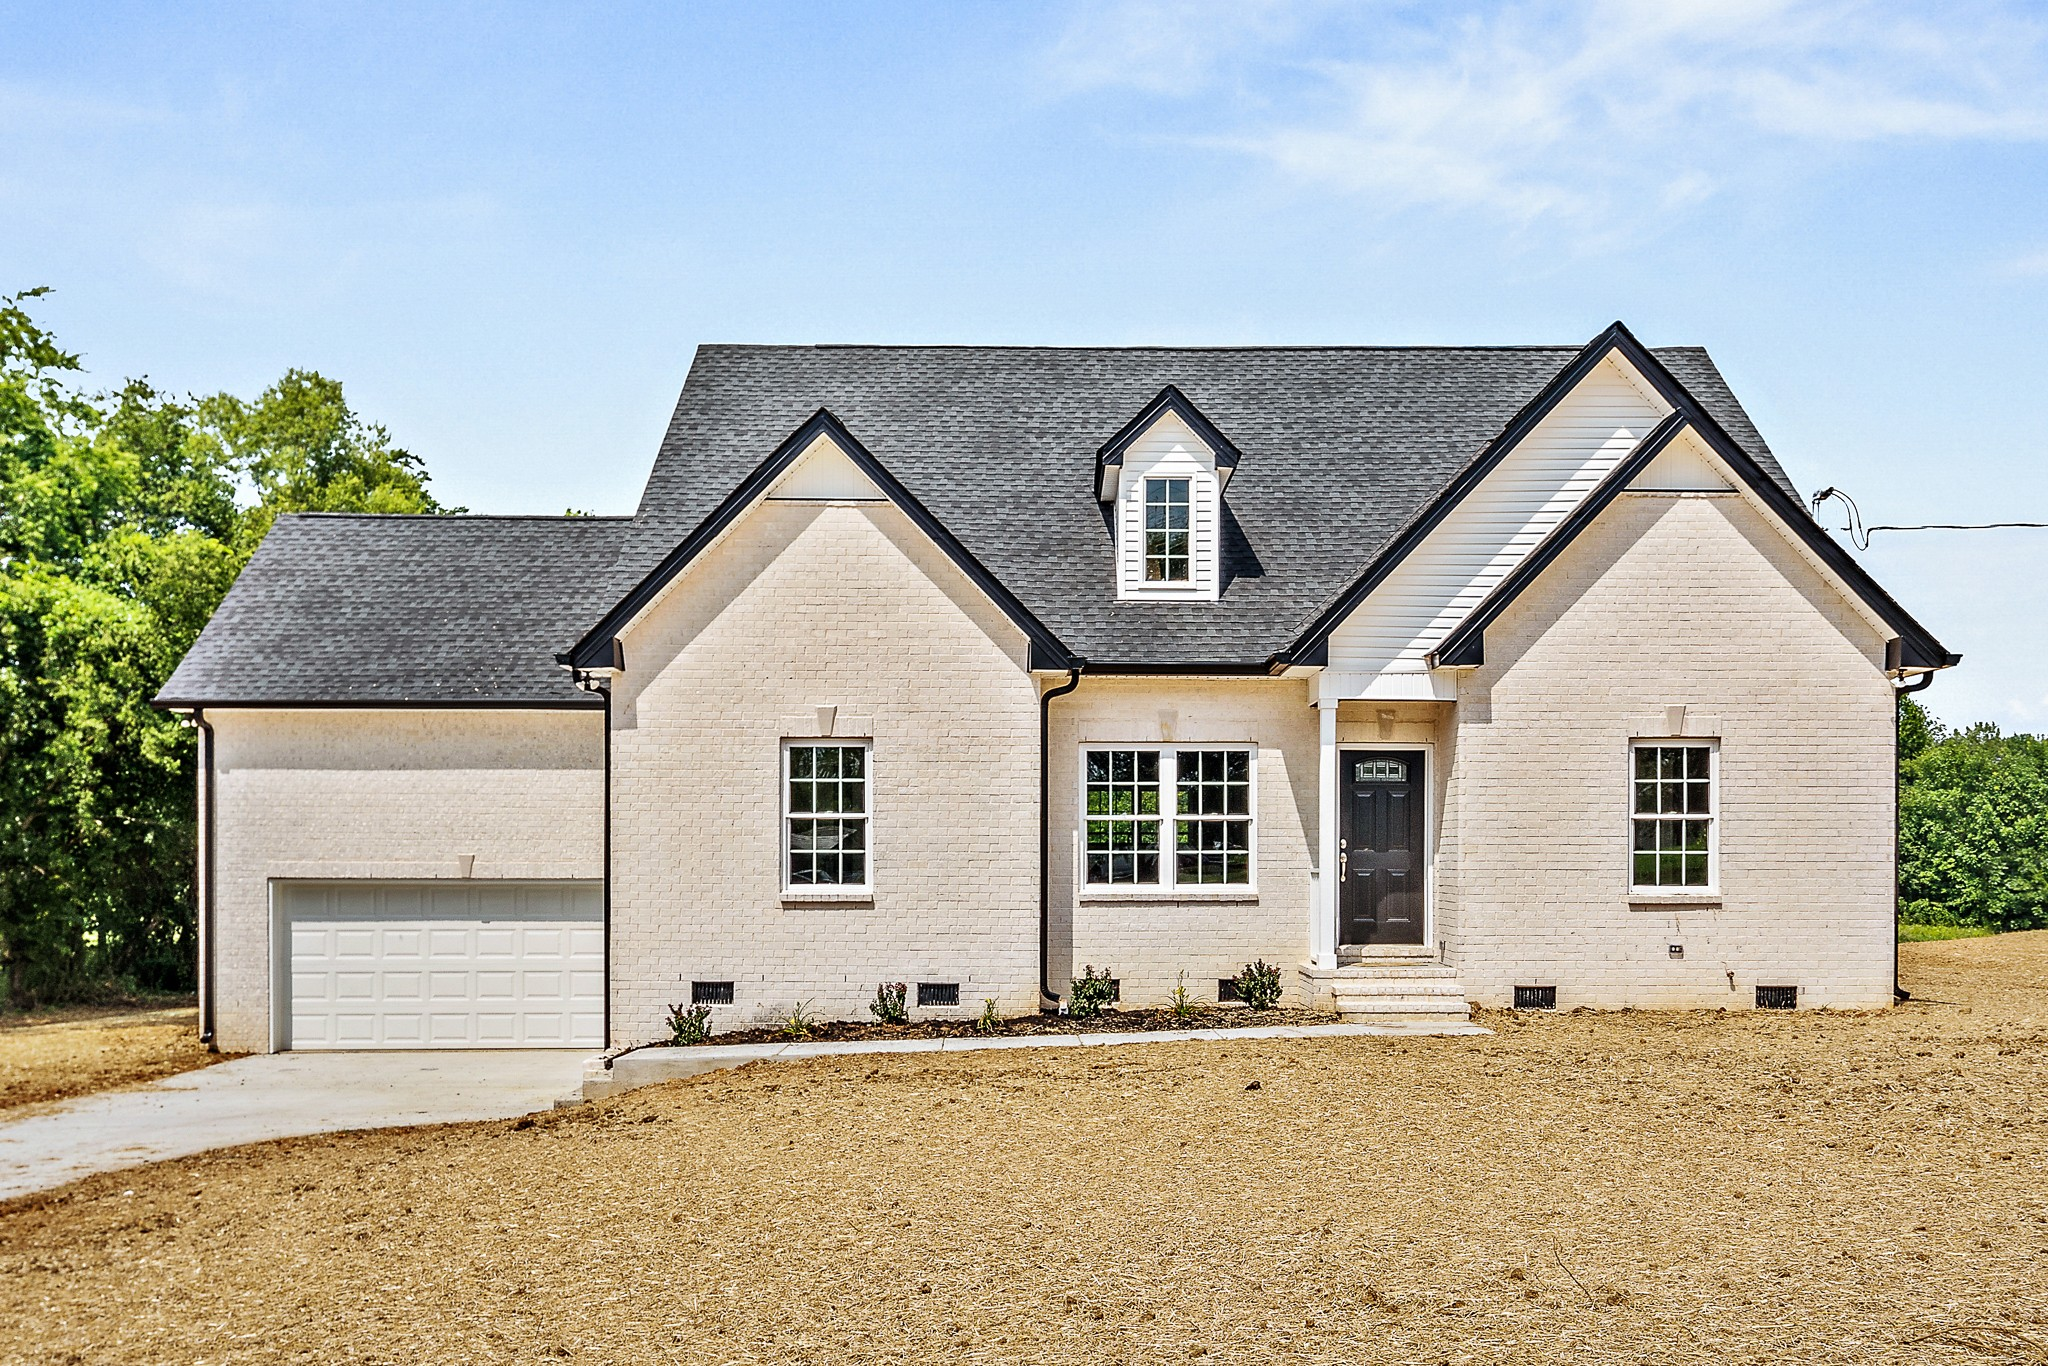 814 Coopertown Rd., Unionville, TN 37180 - Unionville, TN real estate listing